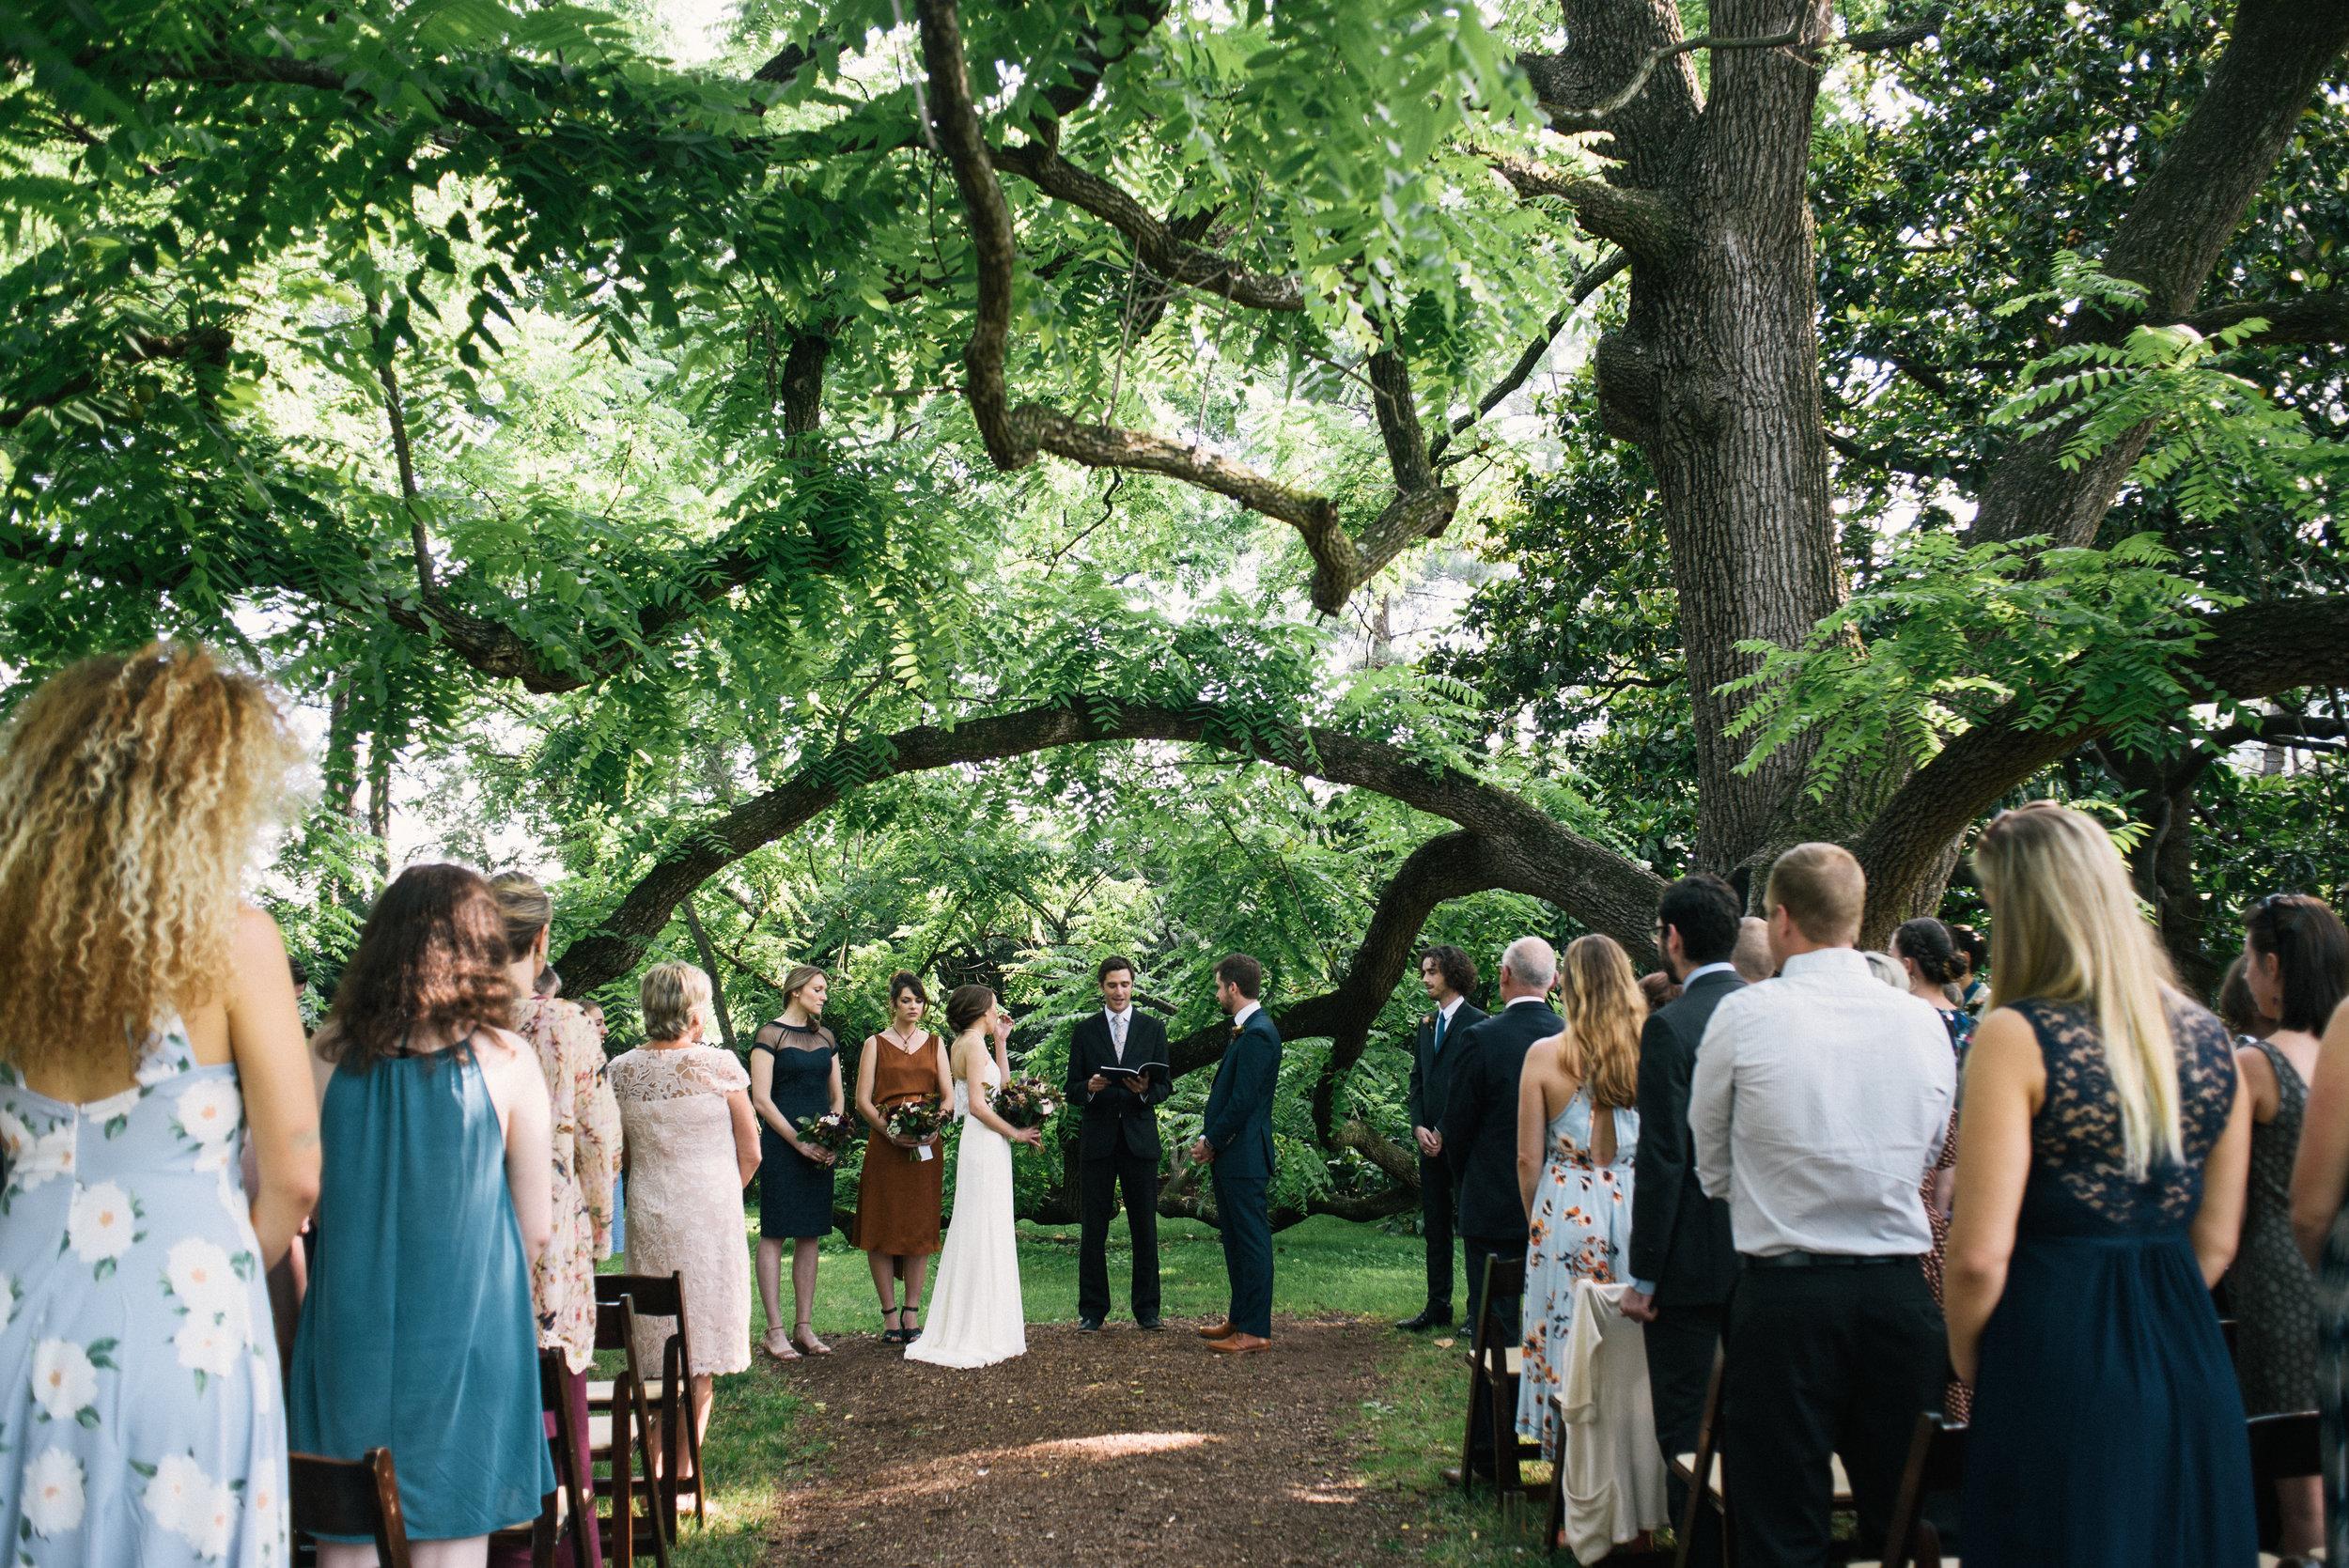 lauren-and-tim-north-carolina-wedding-meg-hill-photo- (727 of 1087).jpg